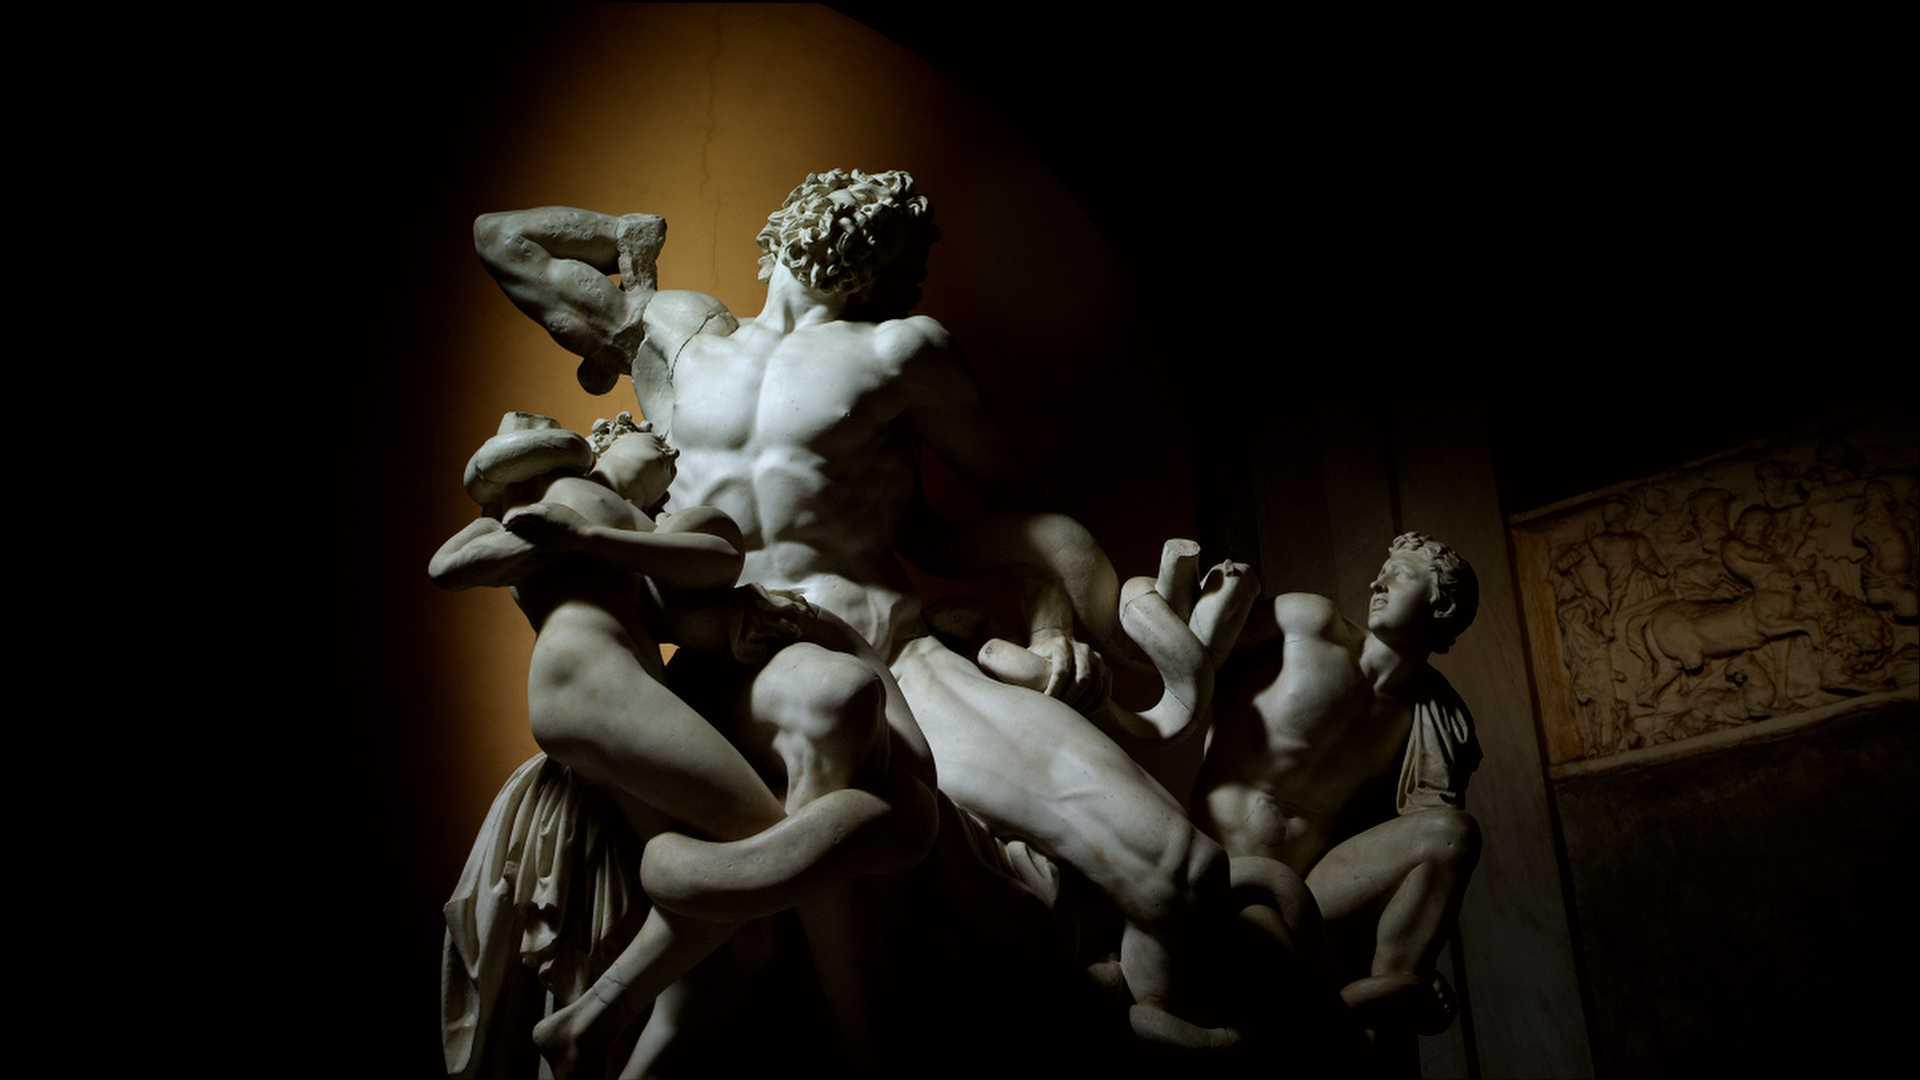 Musei Vaticani 3D, un viaggio in Ultra HD 4K / 3D in esclusiva su Sky   Digitale terrestre: Dtti.it